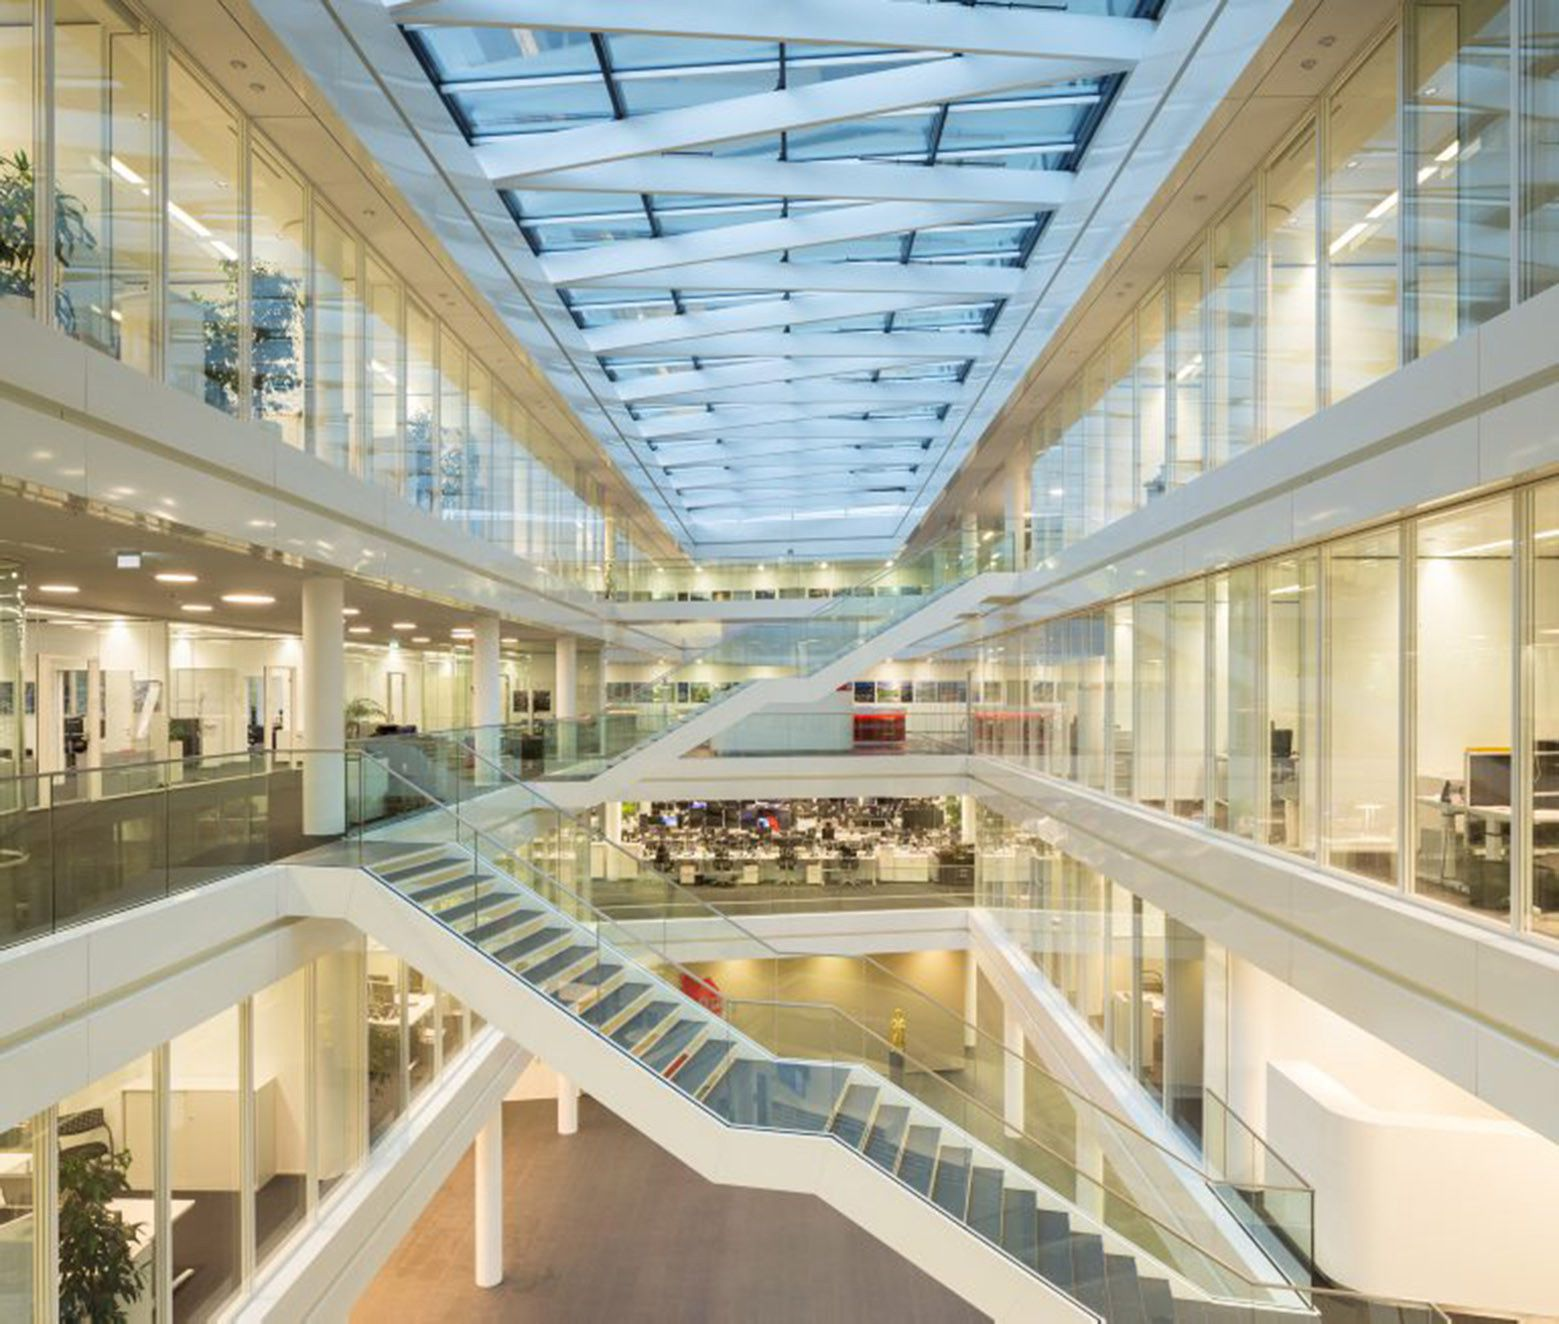 Gallery of new trianel headquarters gmp architekten 1 - Gmp architektur ...